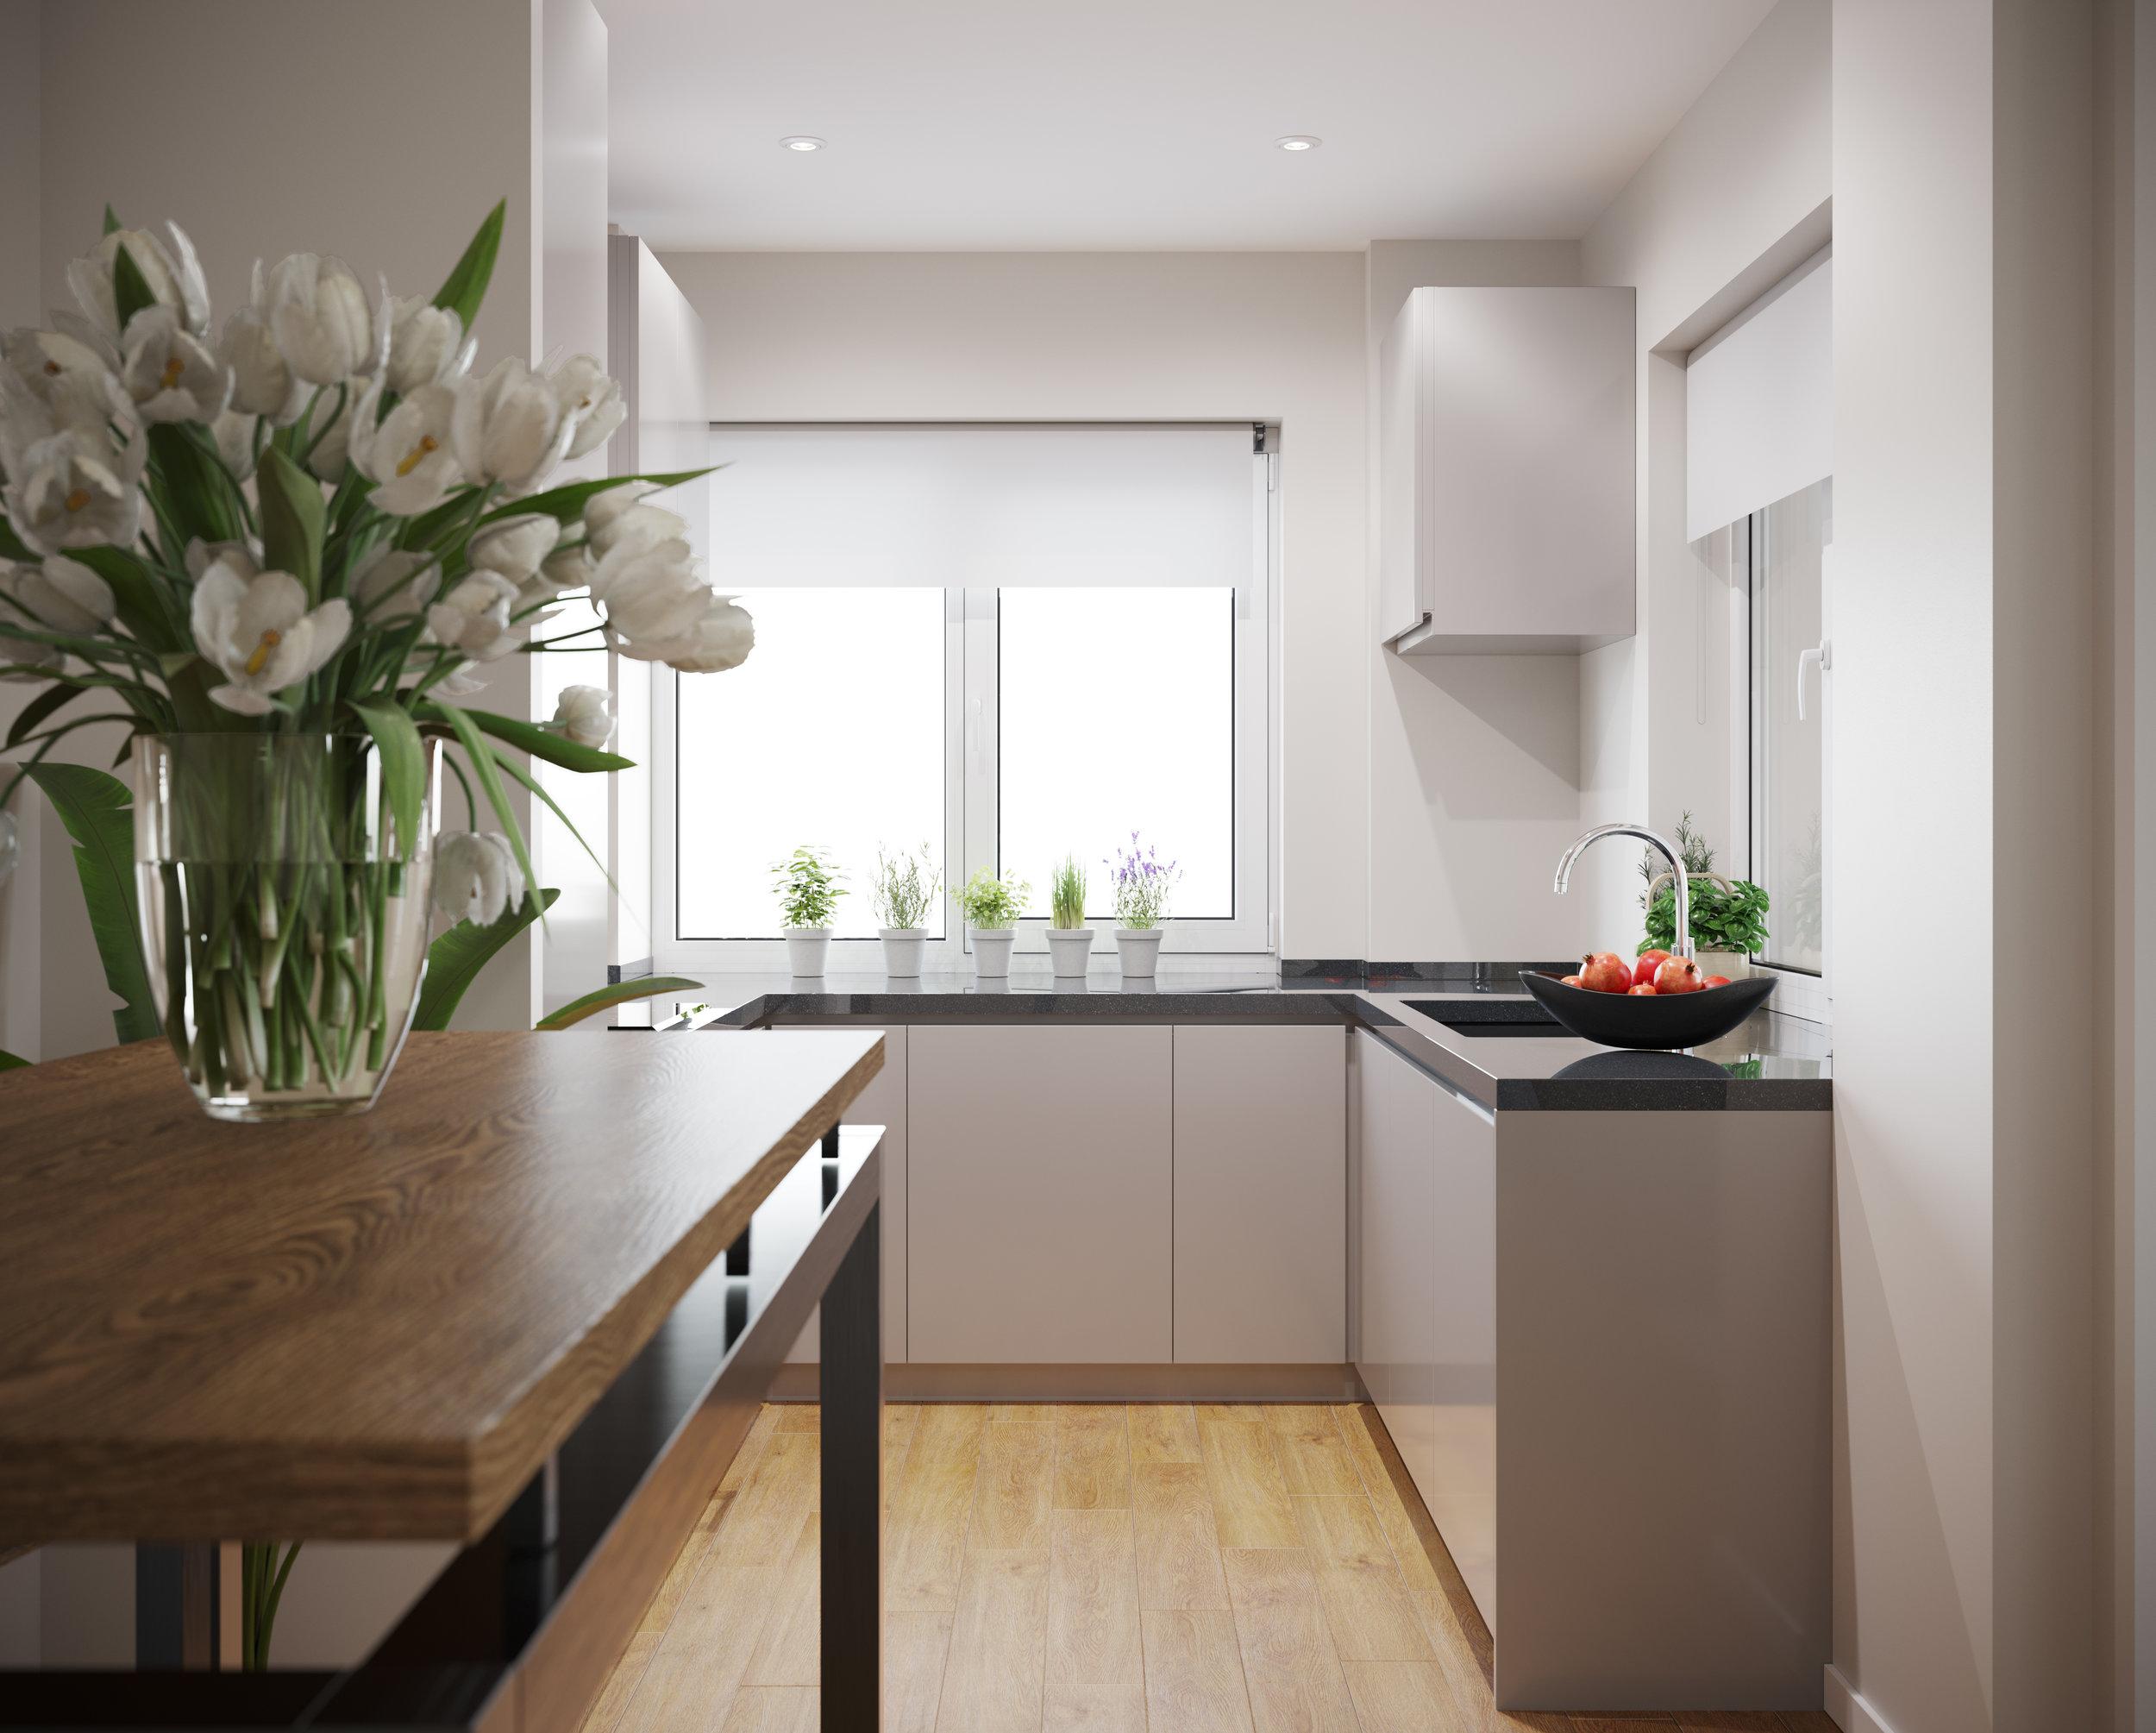 Apartment - Kitchen and Diner CGI - London.jpg